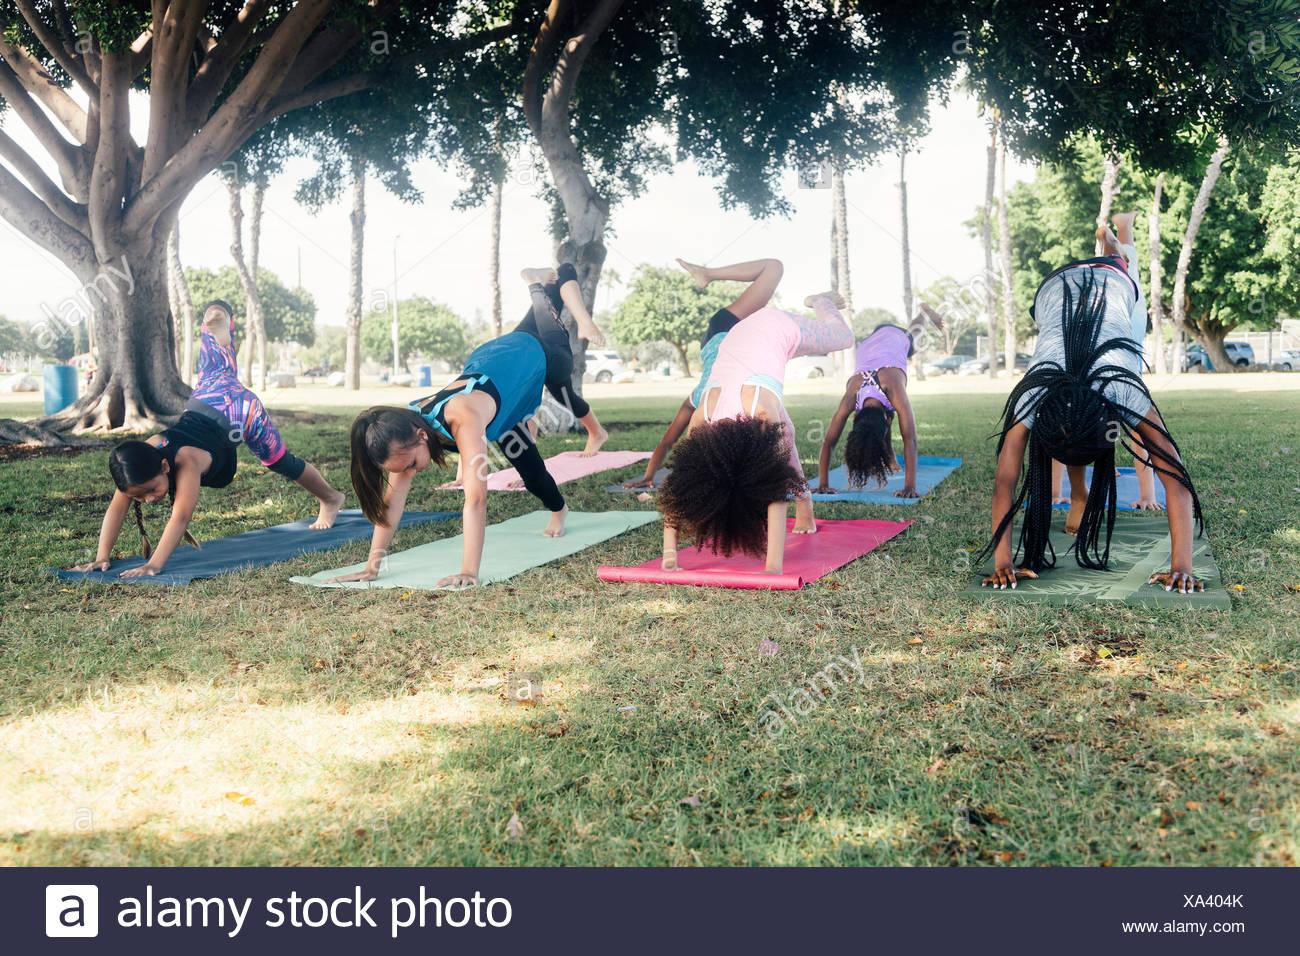 Schoolgirls practicing yoga downward facing dog on school sports field - Stock Image